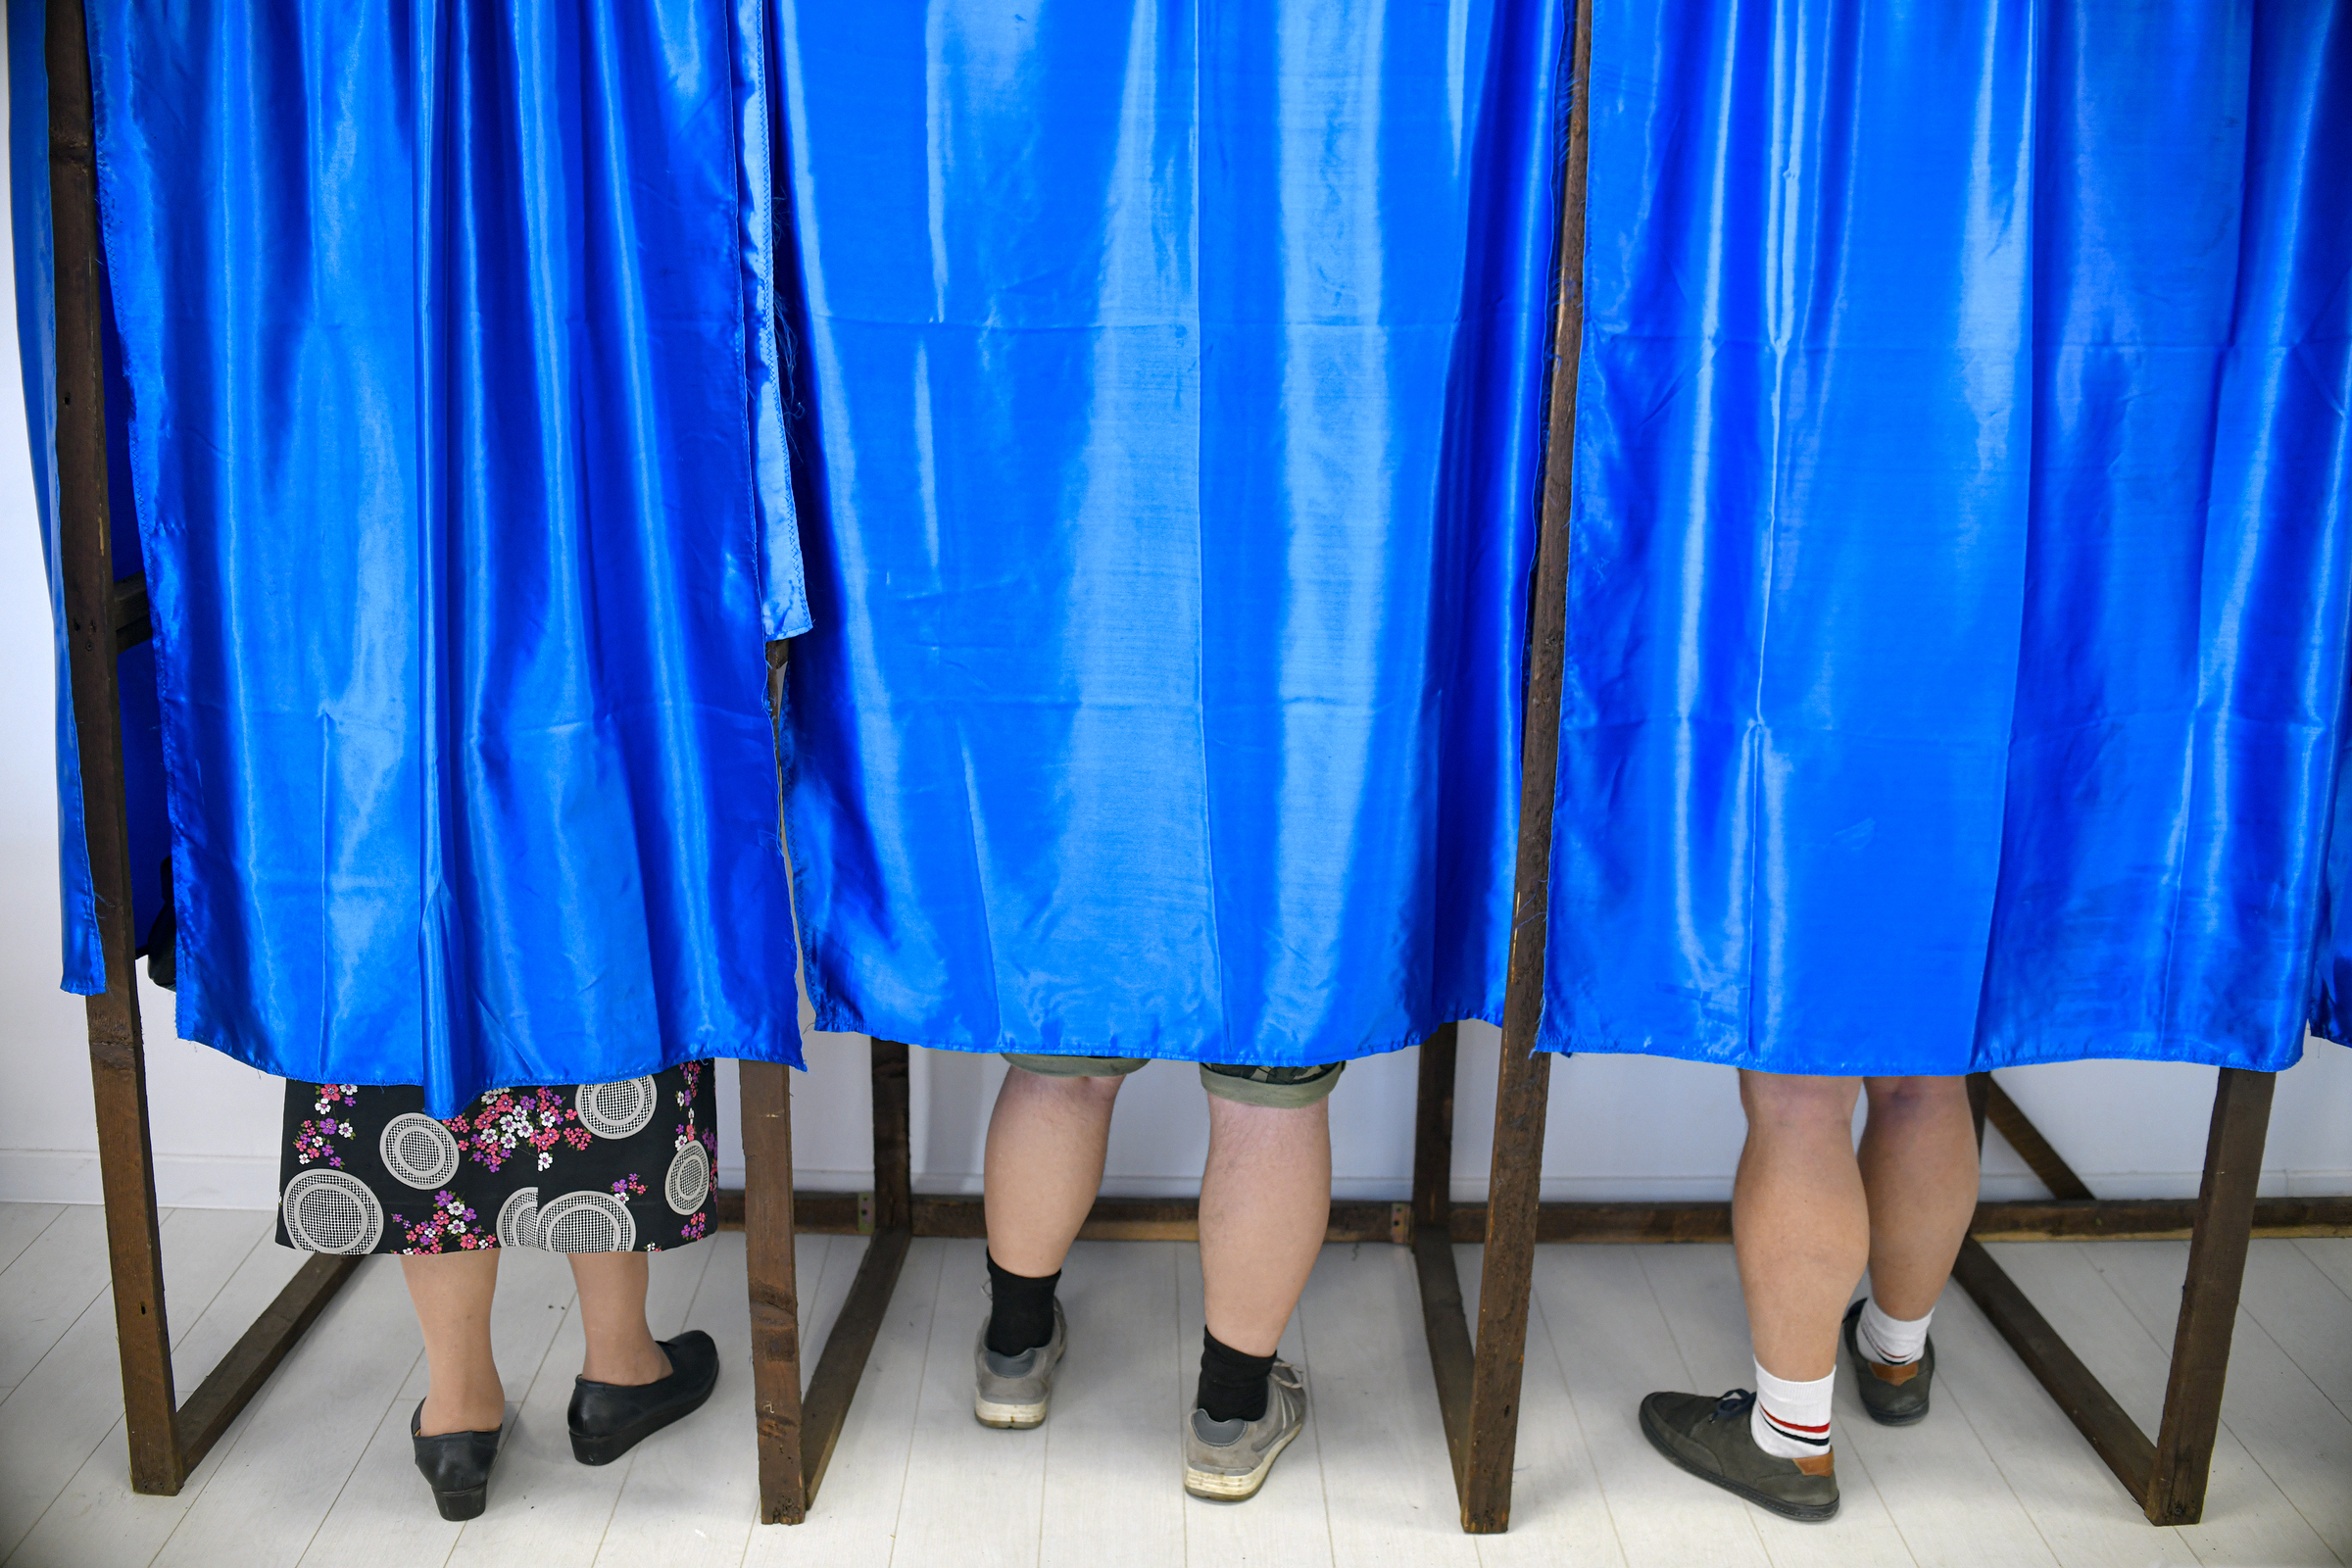 Romania: bassissima affluenza alle elezioni di ieri